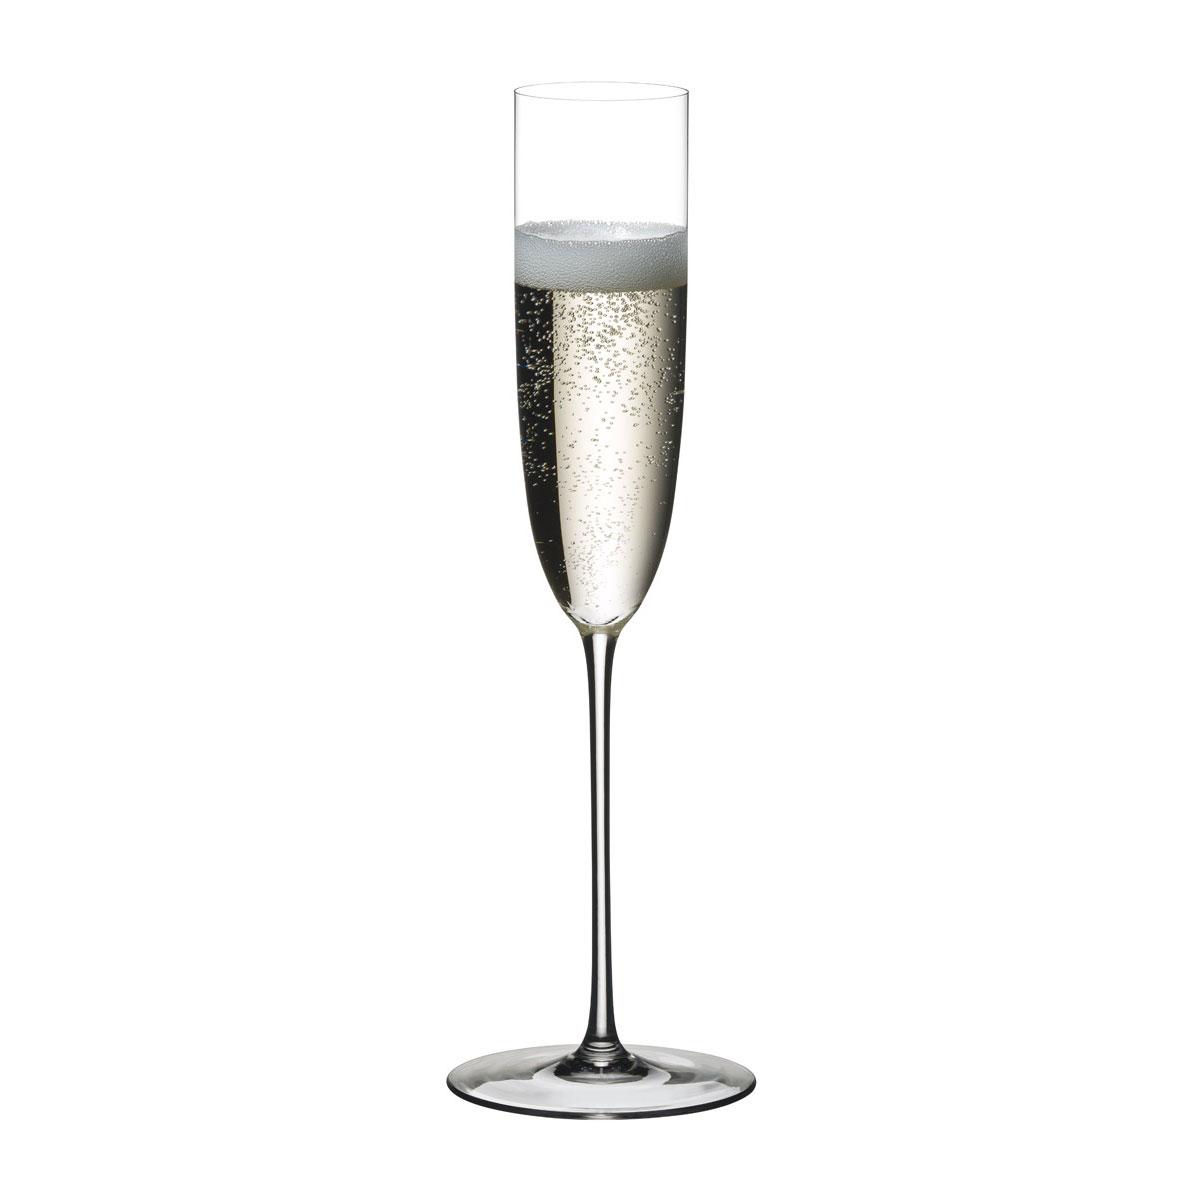 Riedel Sommeliers, Hand Made, Superleggero Champagne Flute Glass, Single